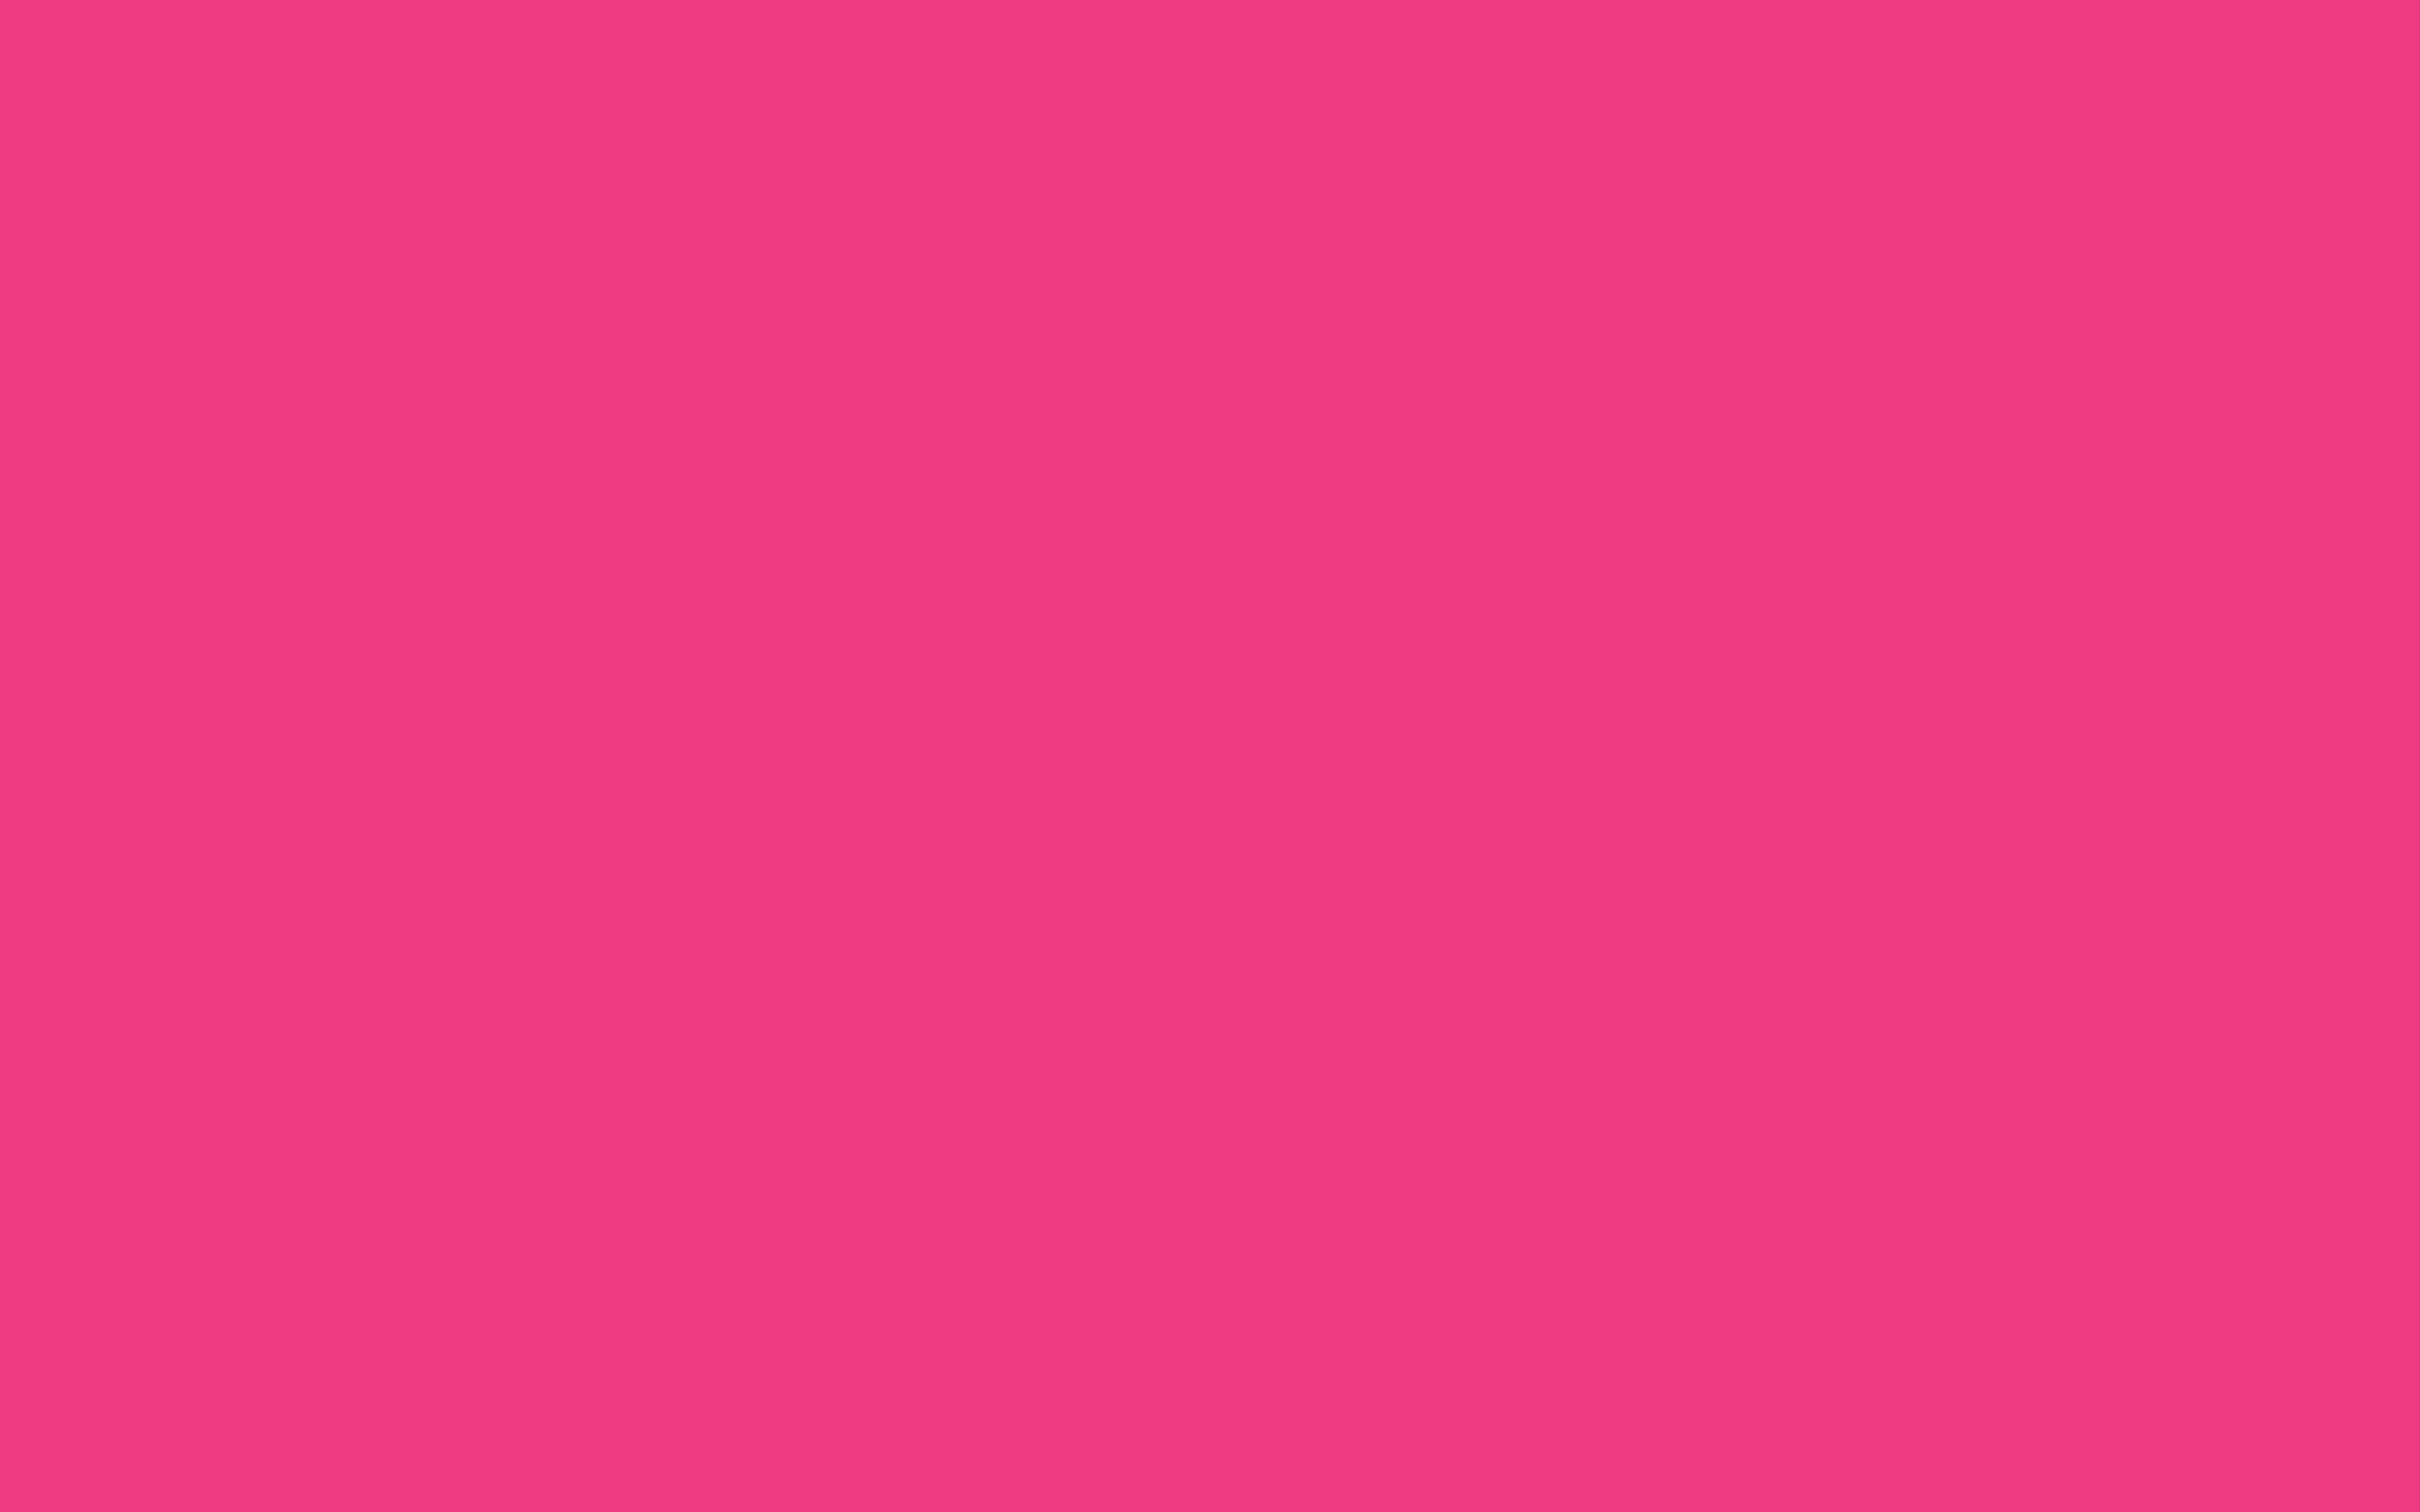 2560x1600 Cerise Pink Solid Color Background